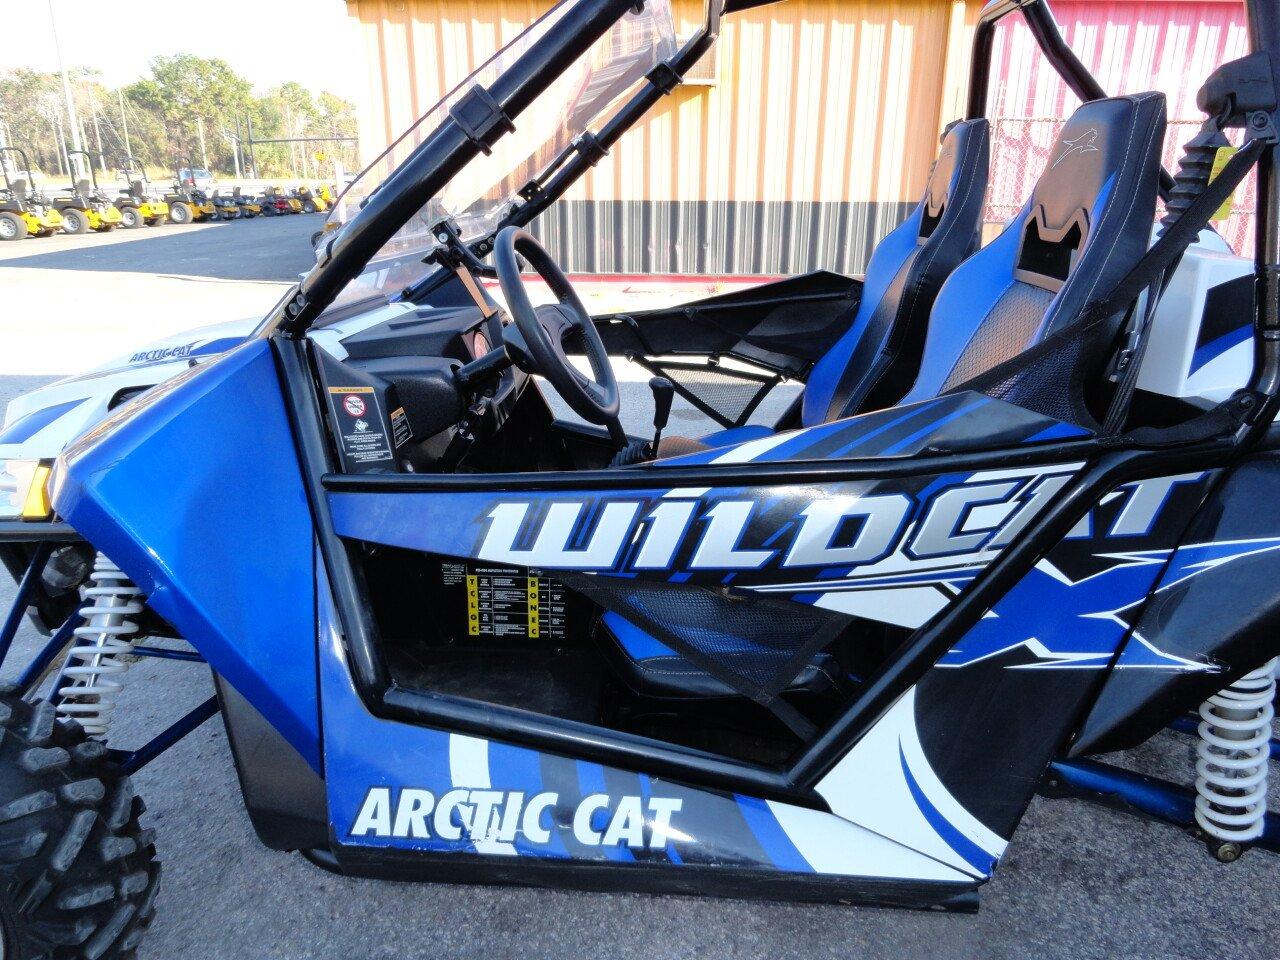 2014 Arctic Cat Wildcat 1000 X for sale near Longwood ...